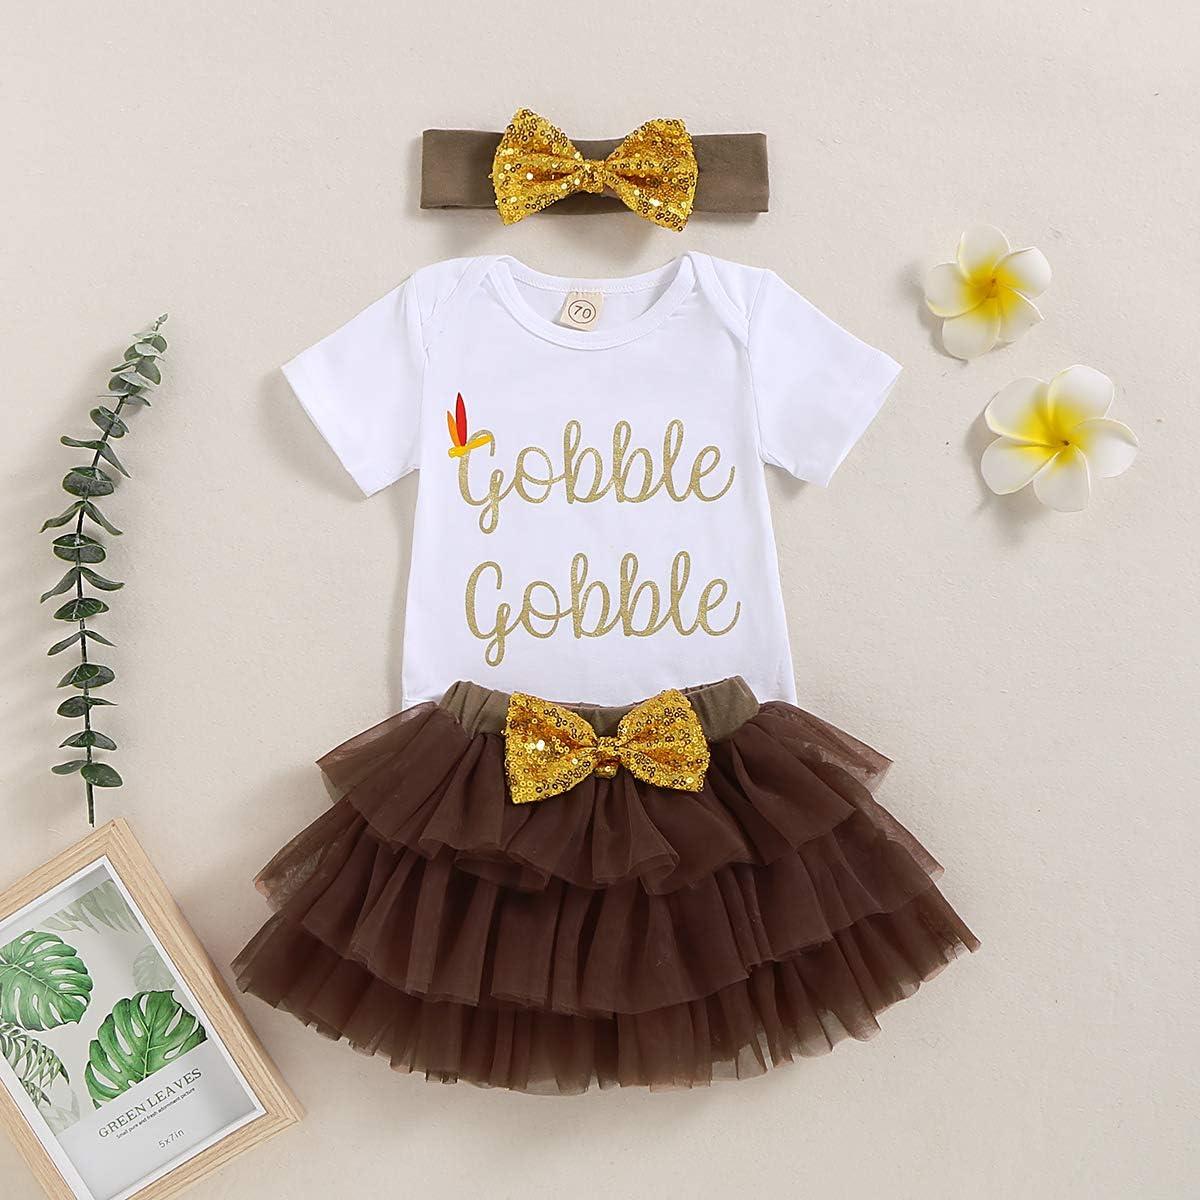 Headband 3Pcs Tutu Dress Infant Newborn Baby Girls 1st Thanksgiving Outfits Skirt Sets Floral Brown Romper